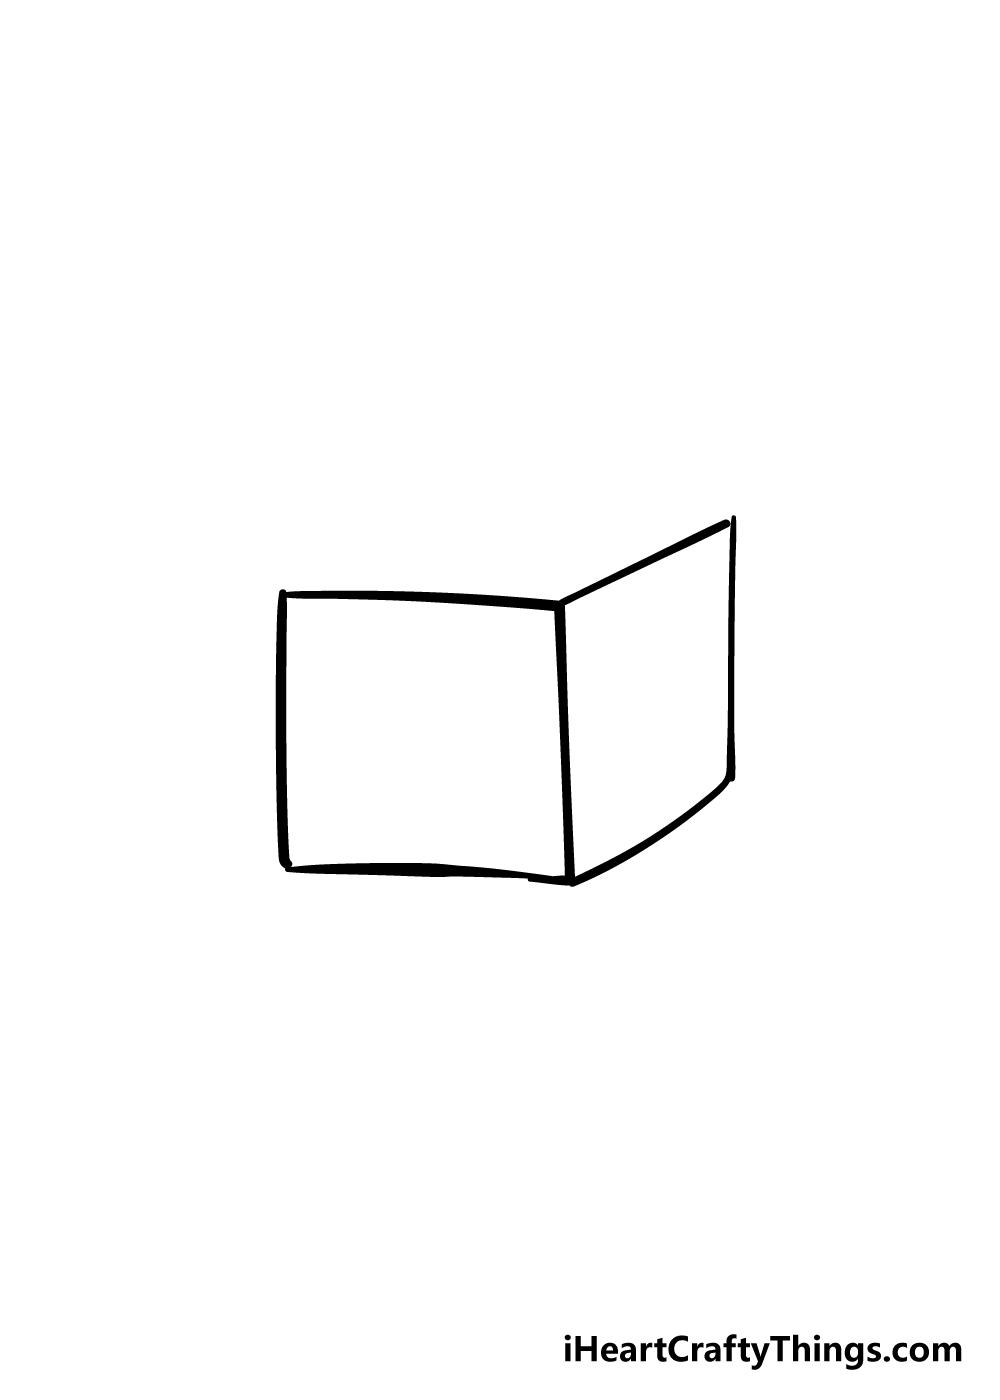 box drawing step 2